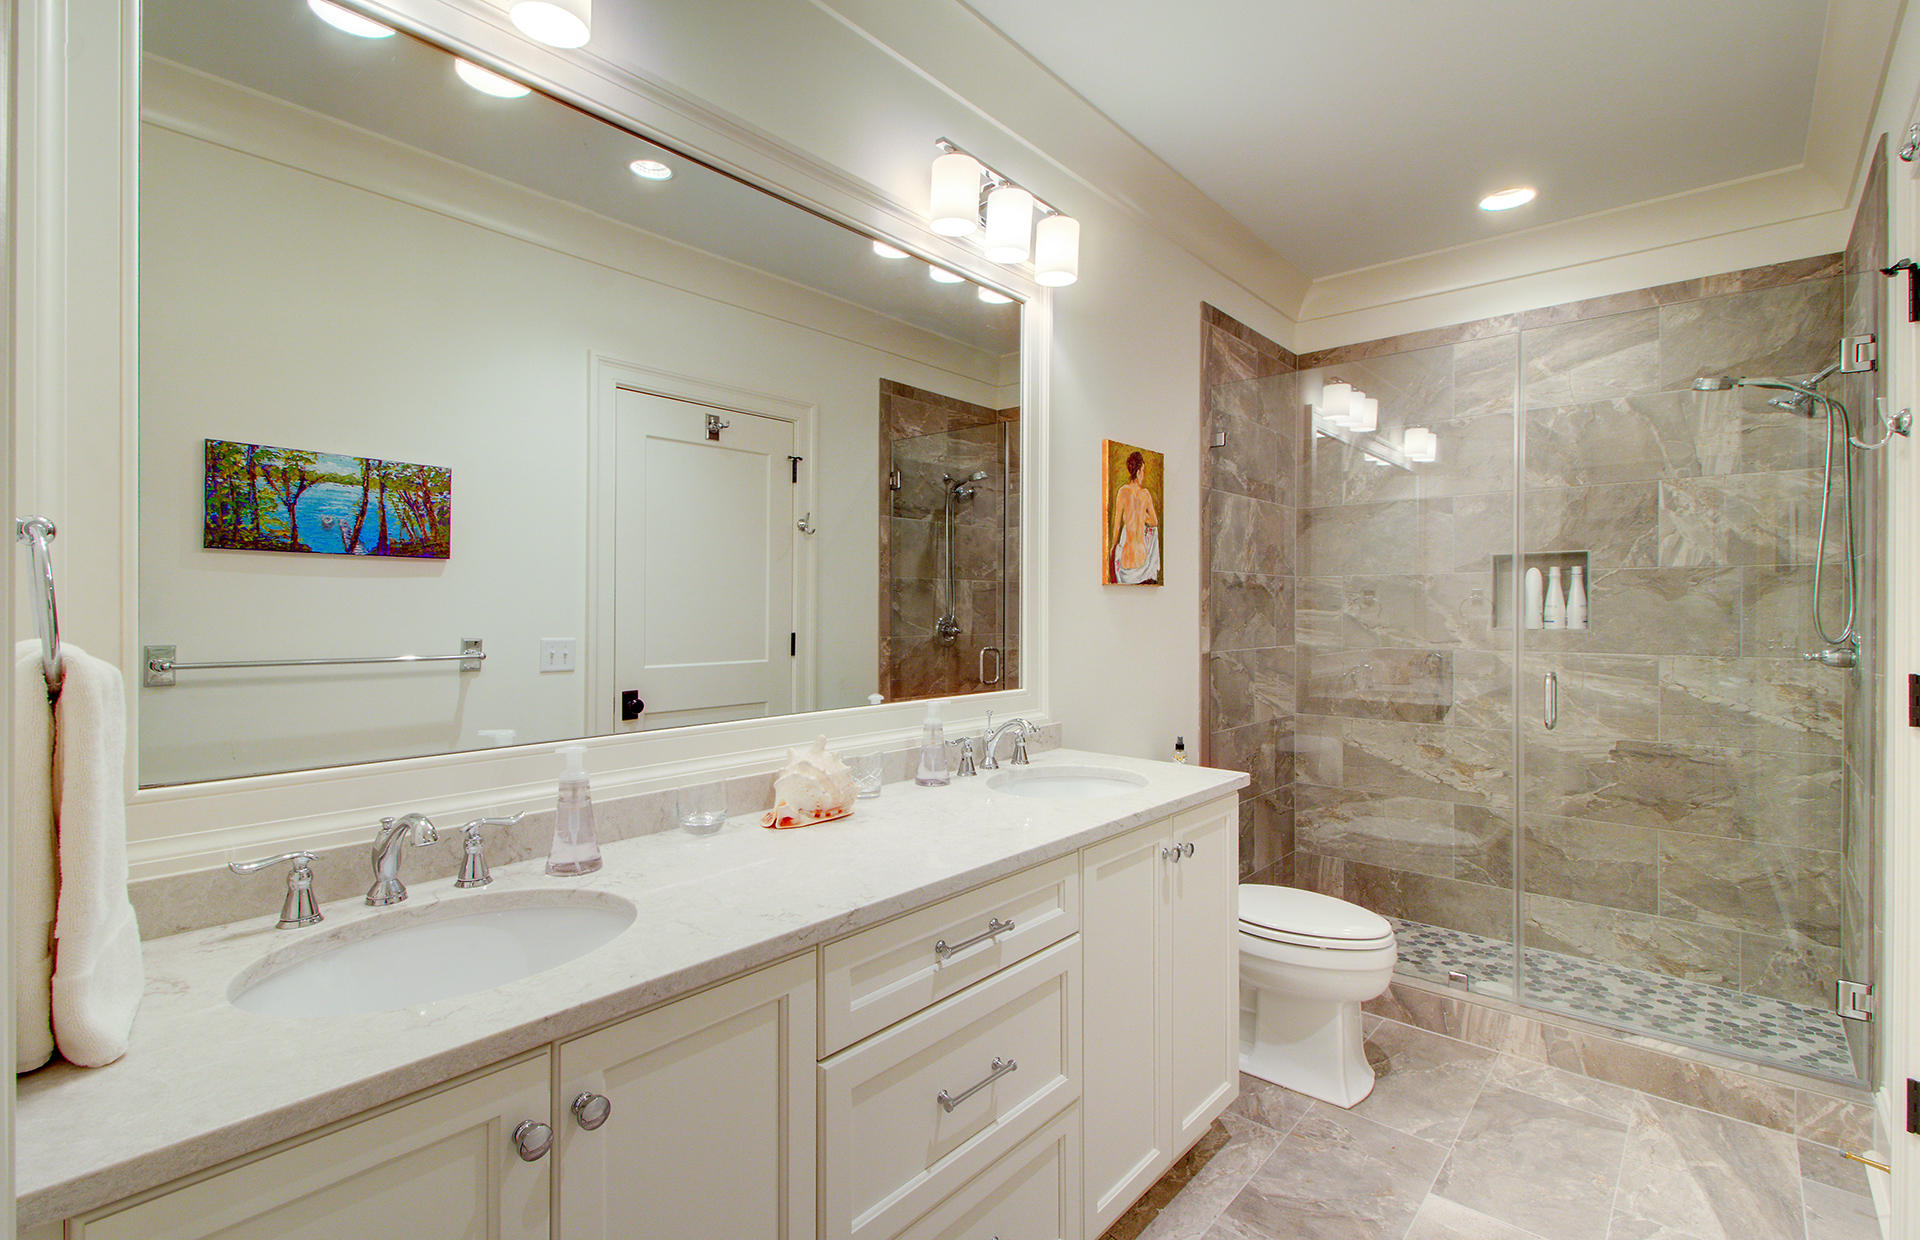 Beresford Hall Homes For Sale - 253 Grand Park, Charleston, SC - 40